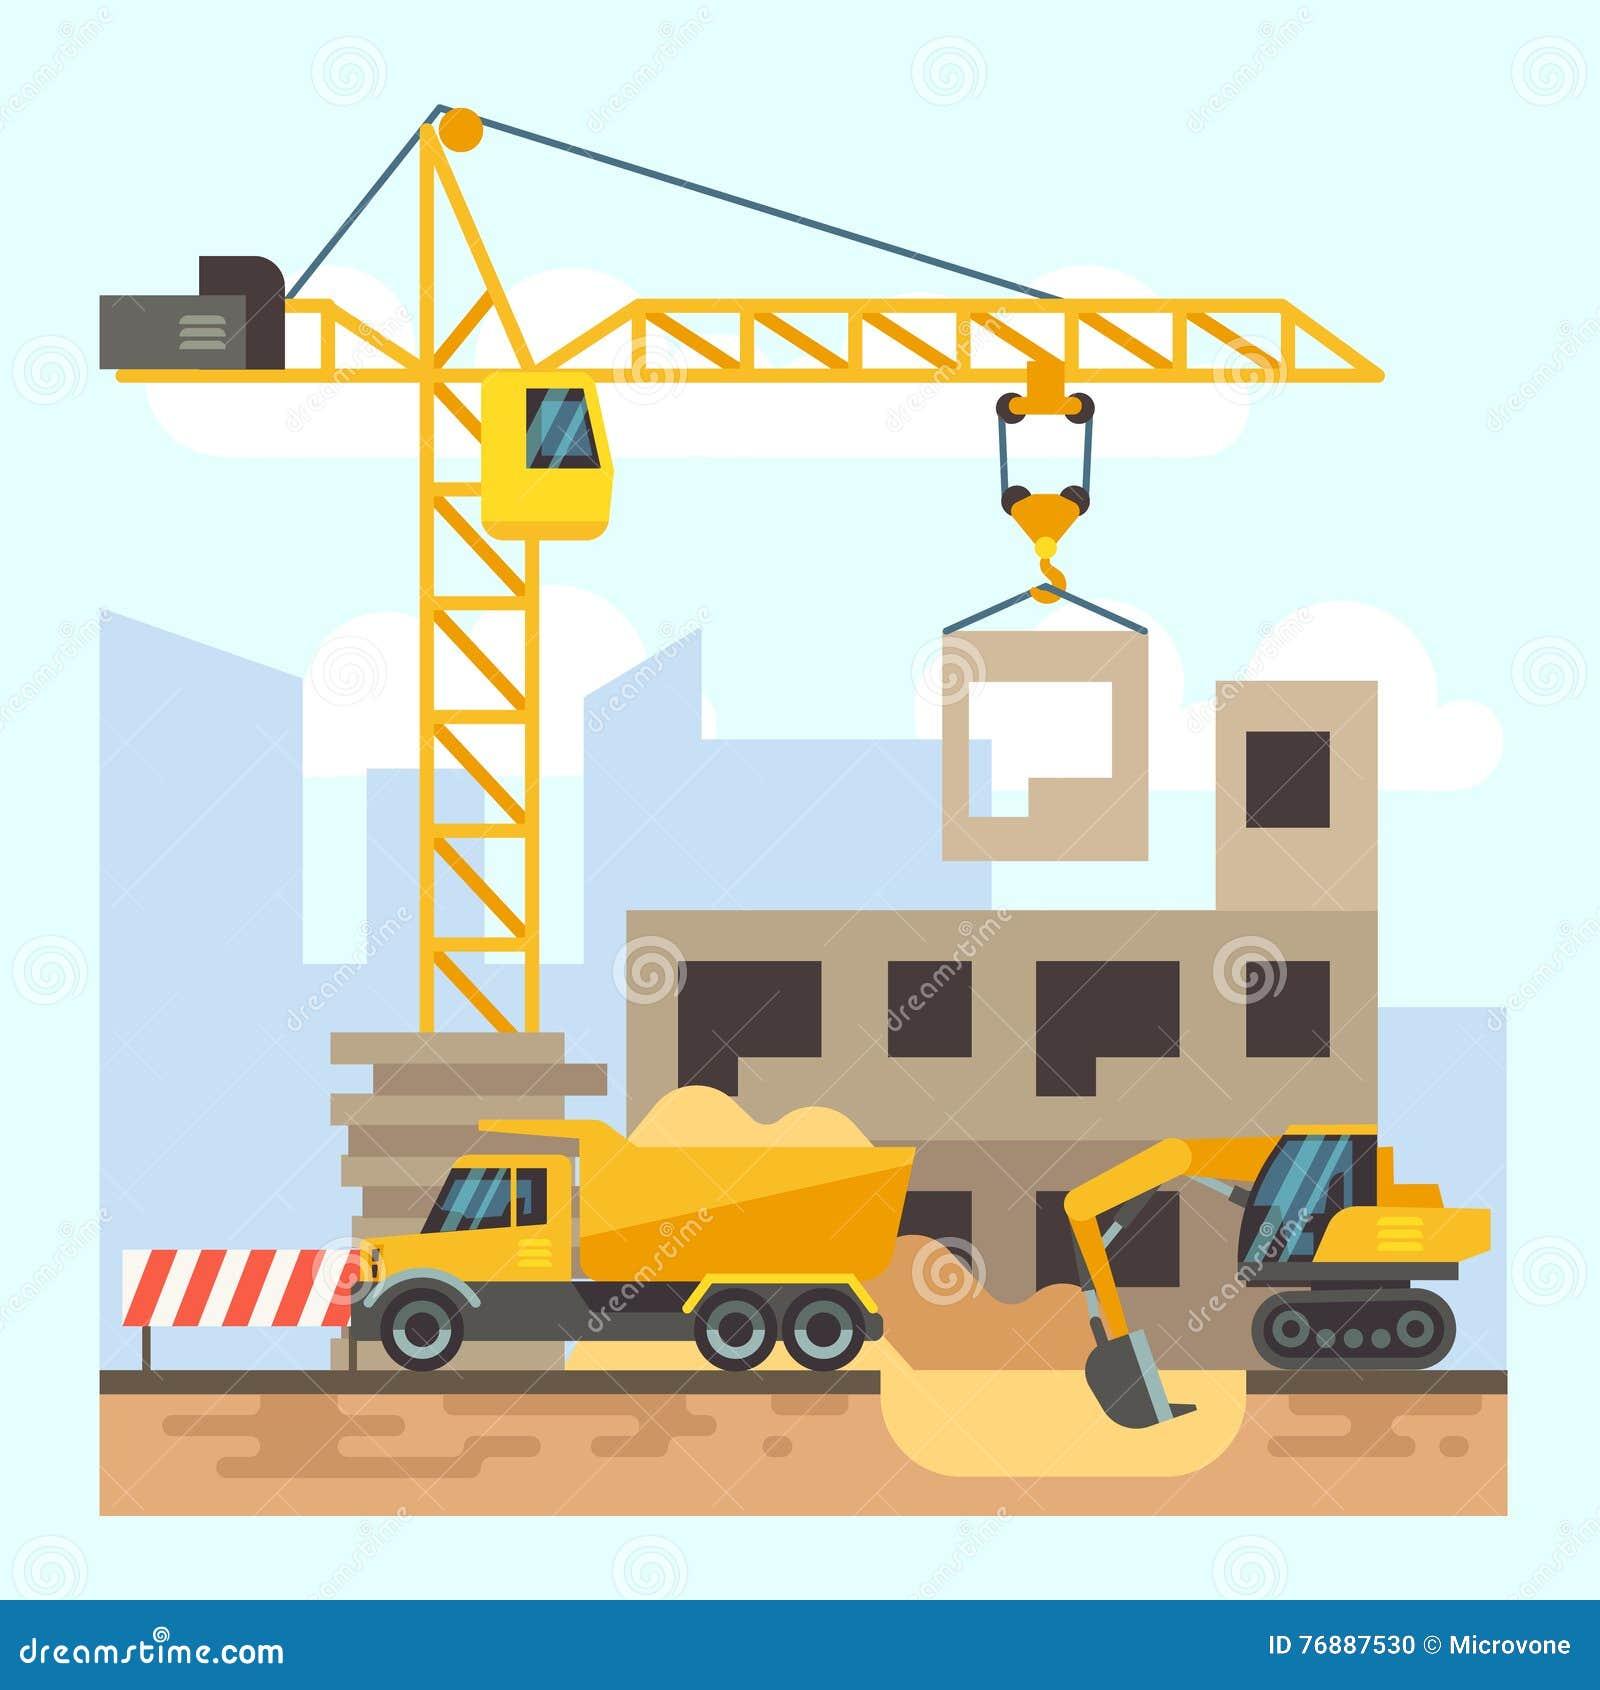 Building Construction Cartoon : City development concept build banner in flat style